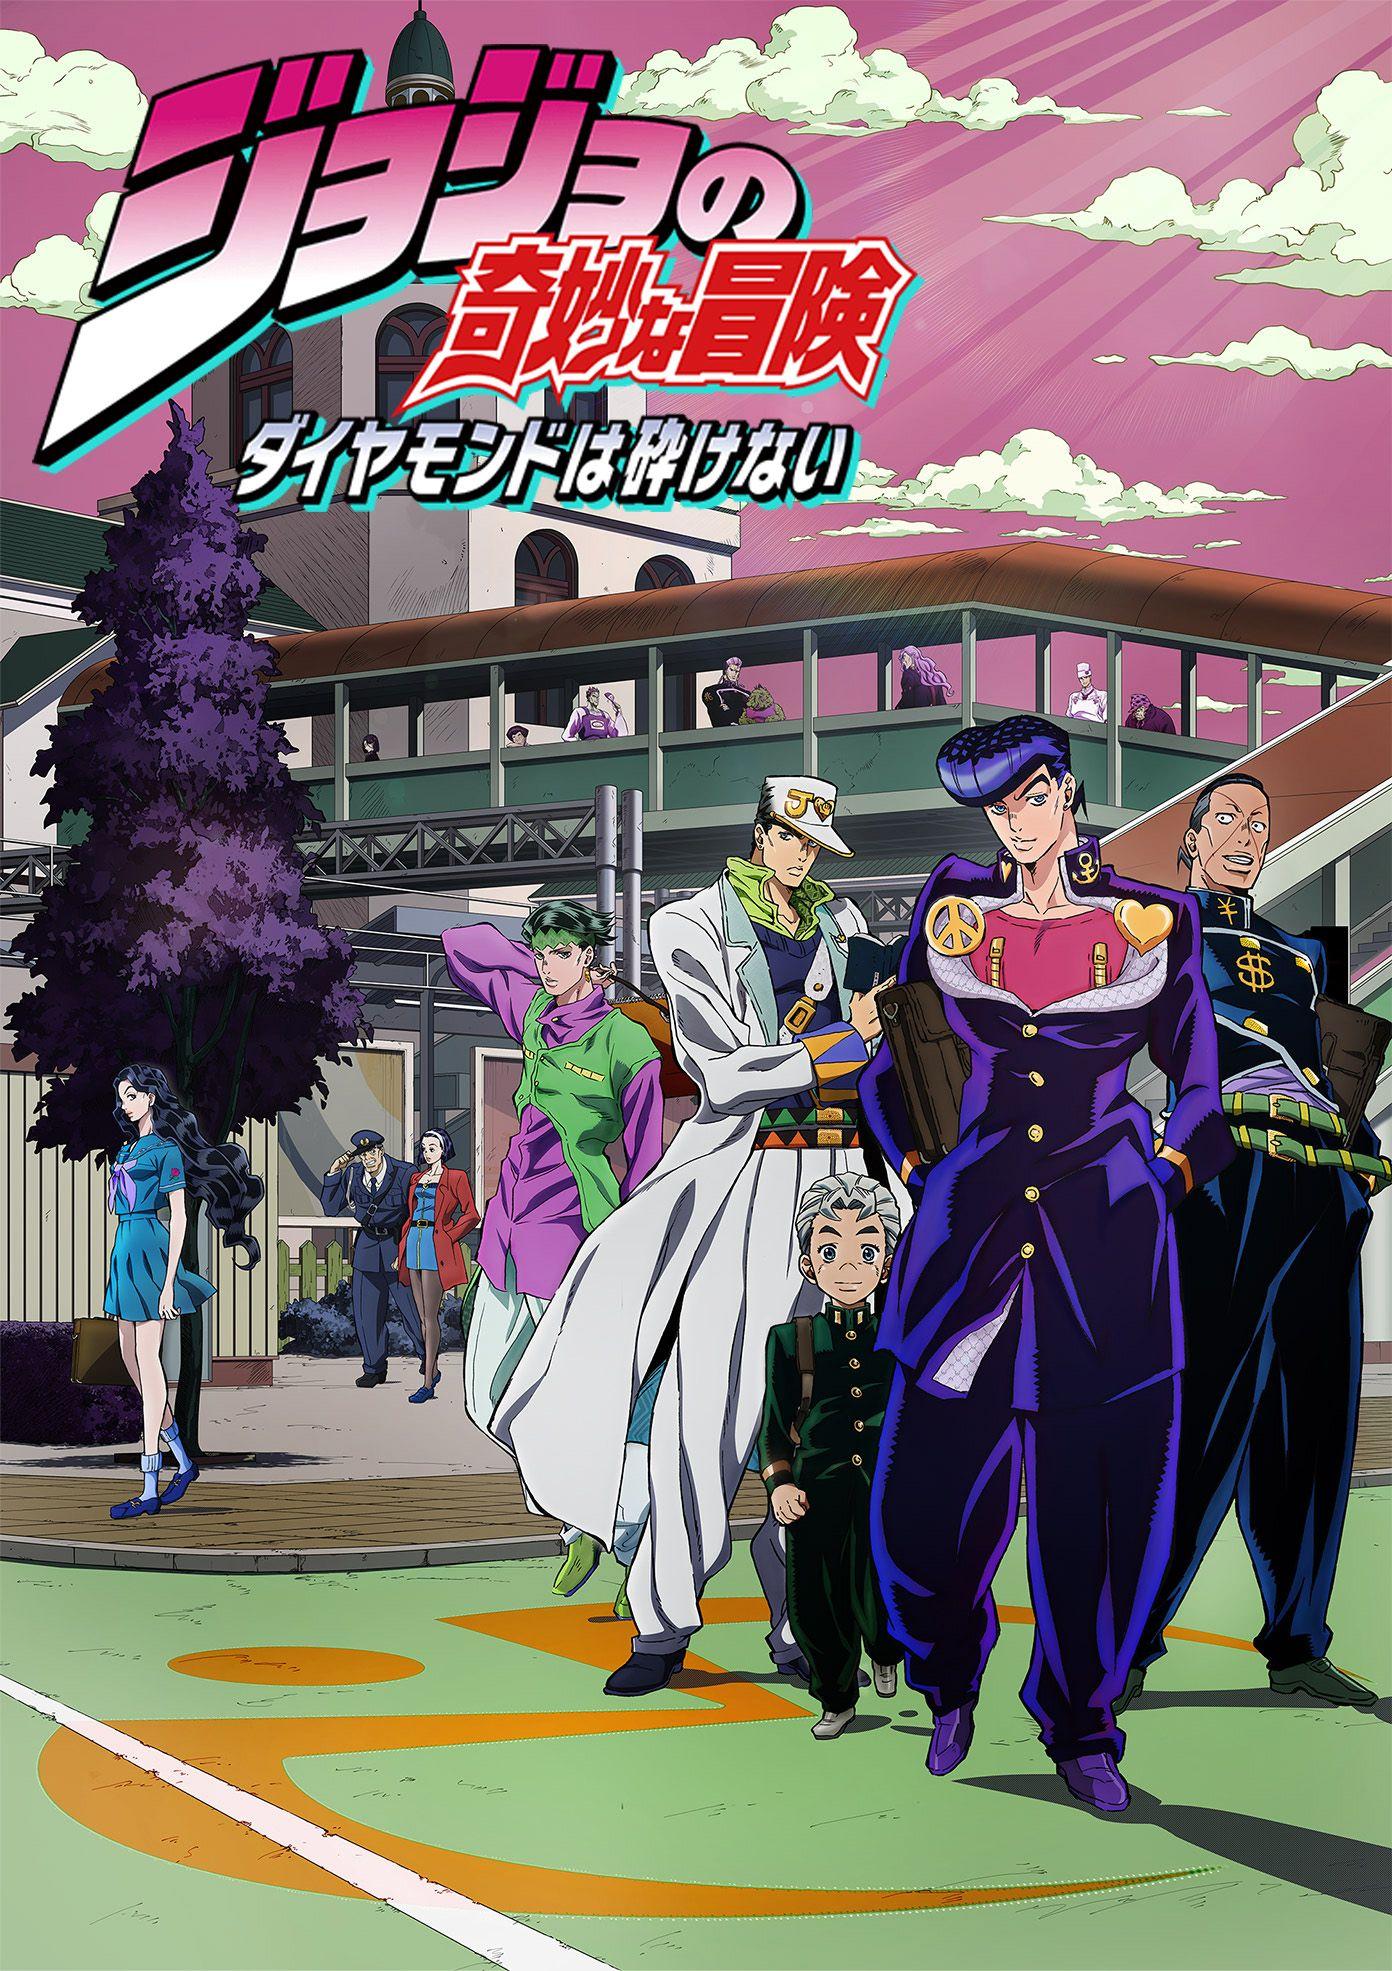 Jojo S Bizarre Adventure Diamond Is Unbreakable Jojo S Bizarre Adventure Anime Jojo Bizarre Jojo Bizzare Adventure